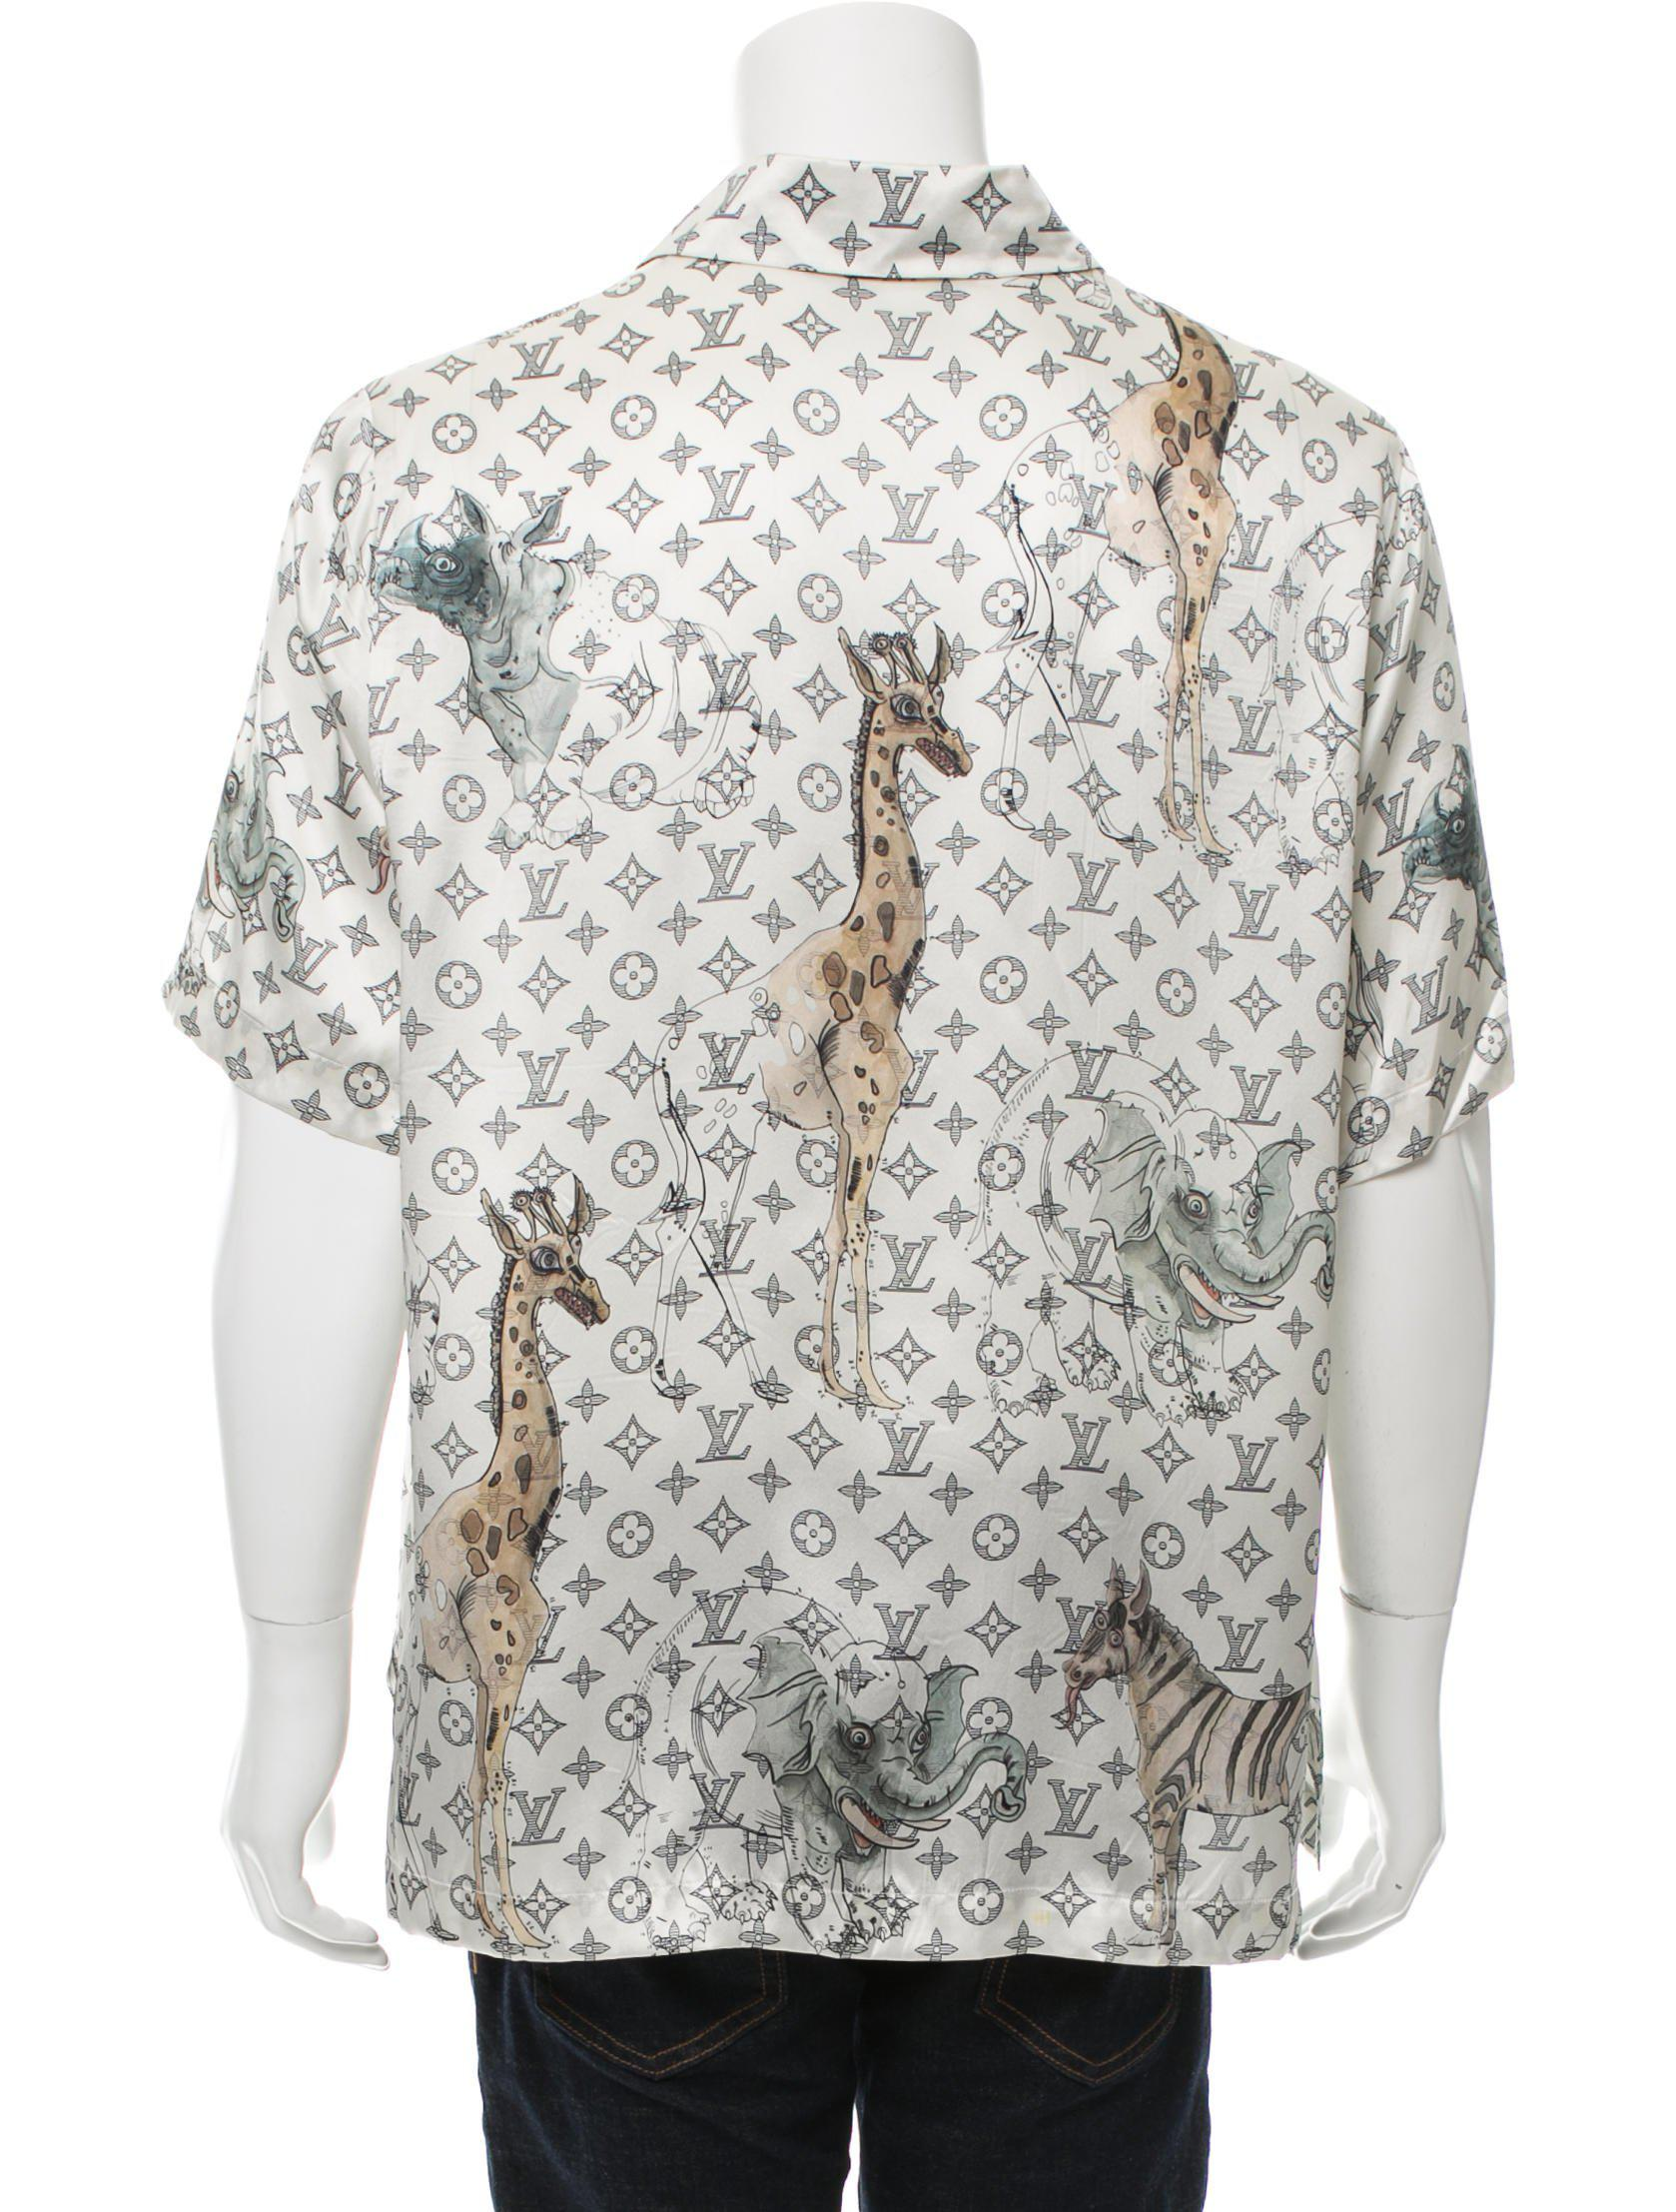 48da90d4753a Louis Vuitton Polo Shirt Giraffe